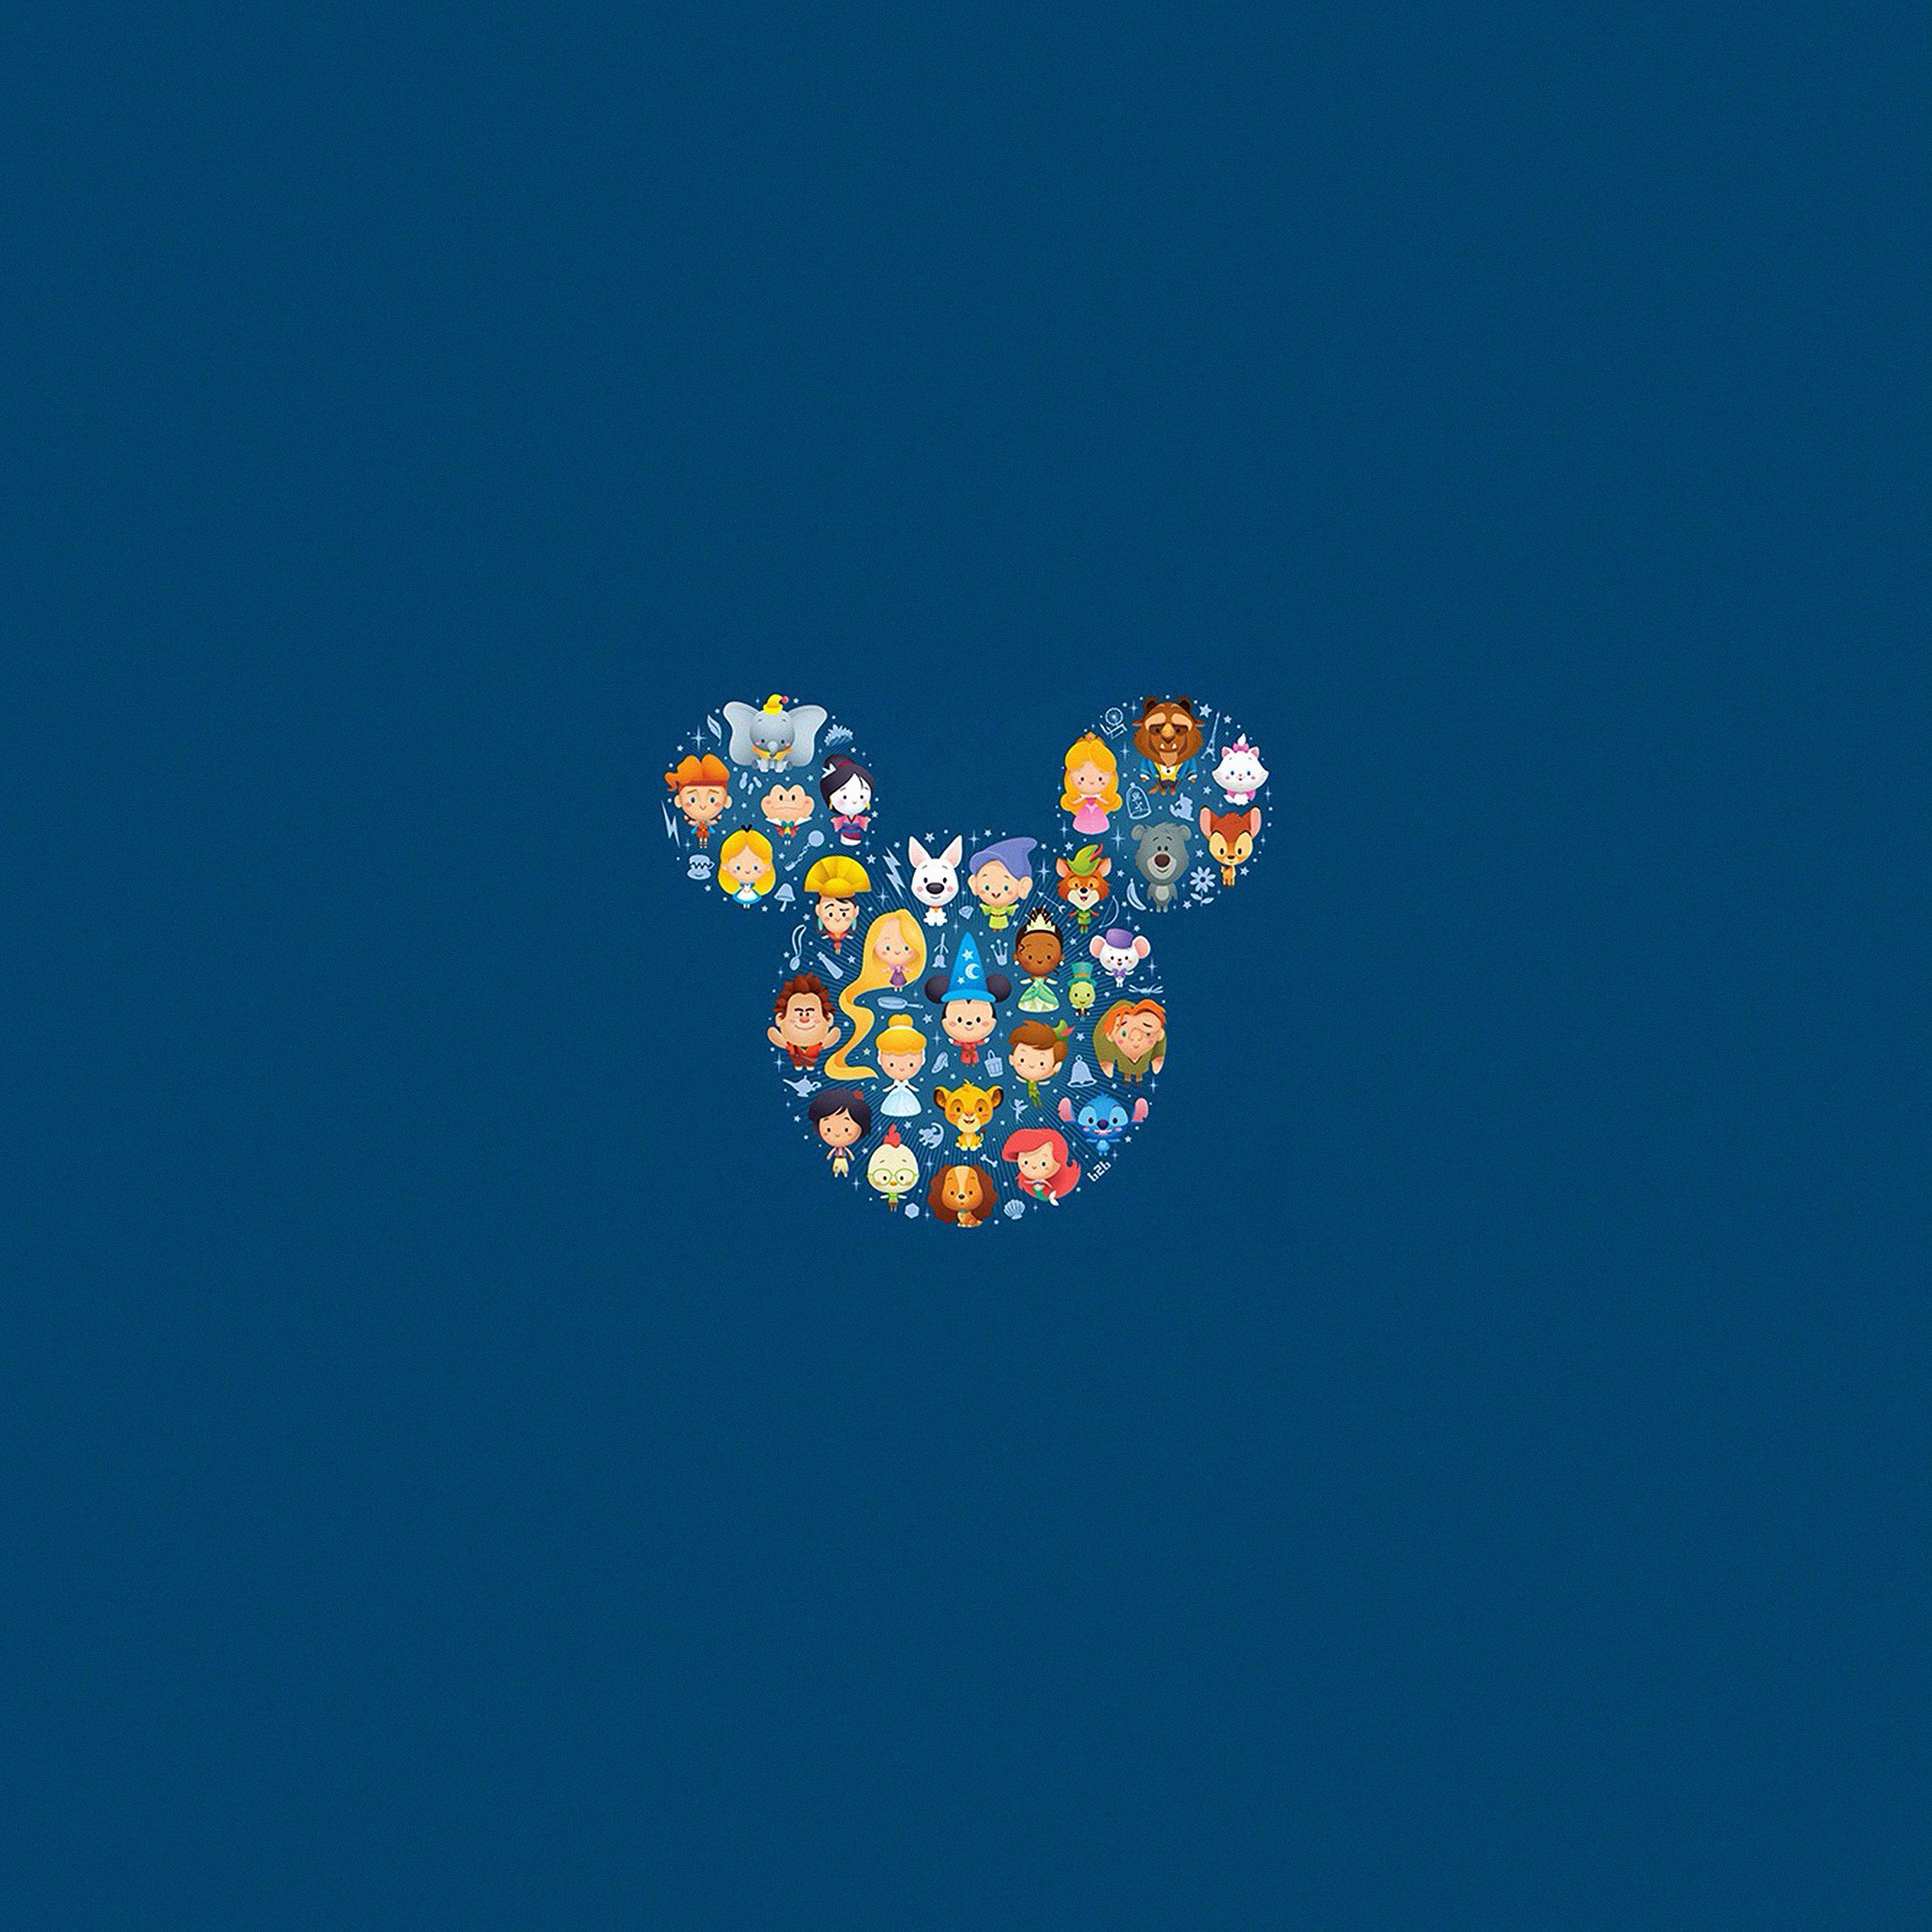 Disney Ipad Mini Wallpapers Top Free Disney Ipad Mini Backgrounds Wallpaperaccess